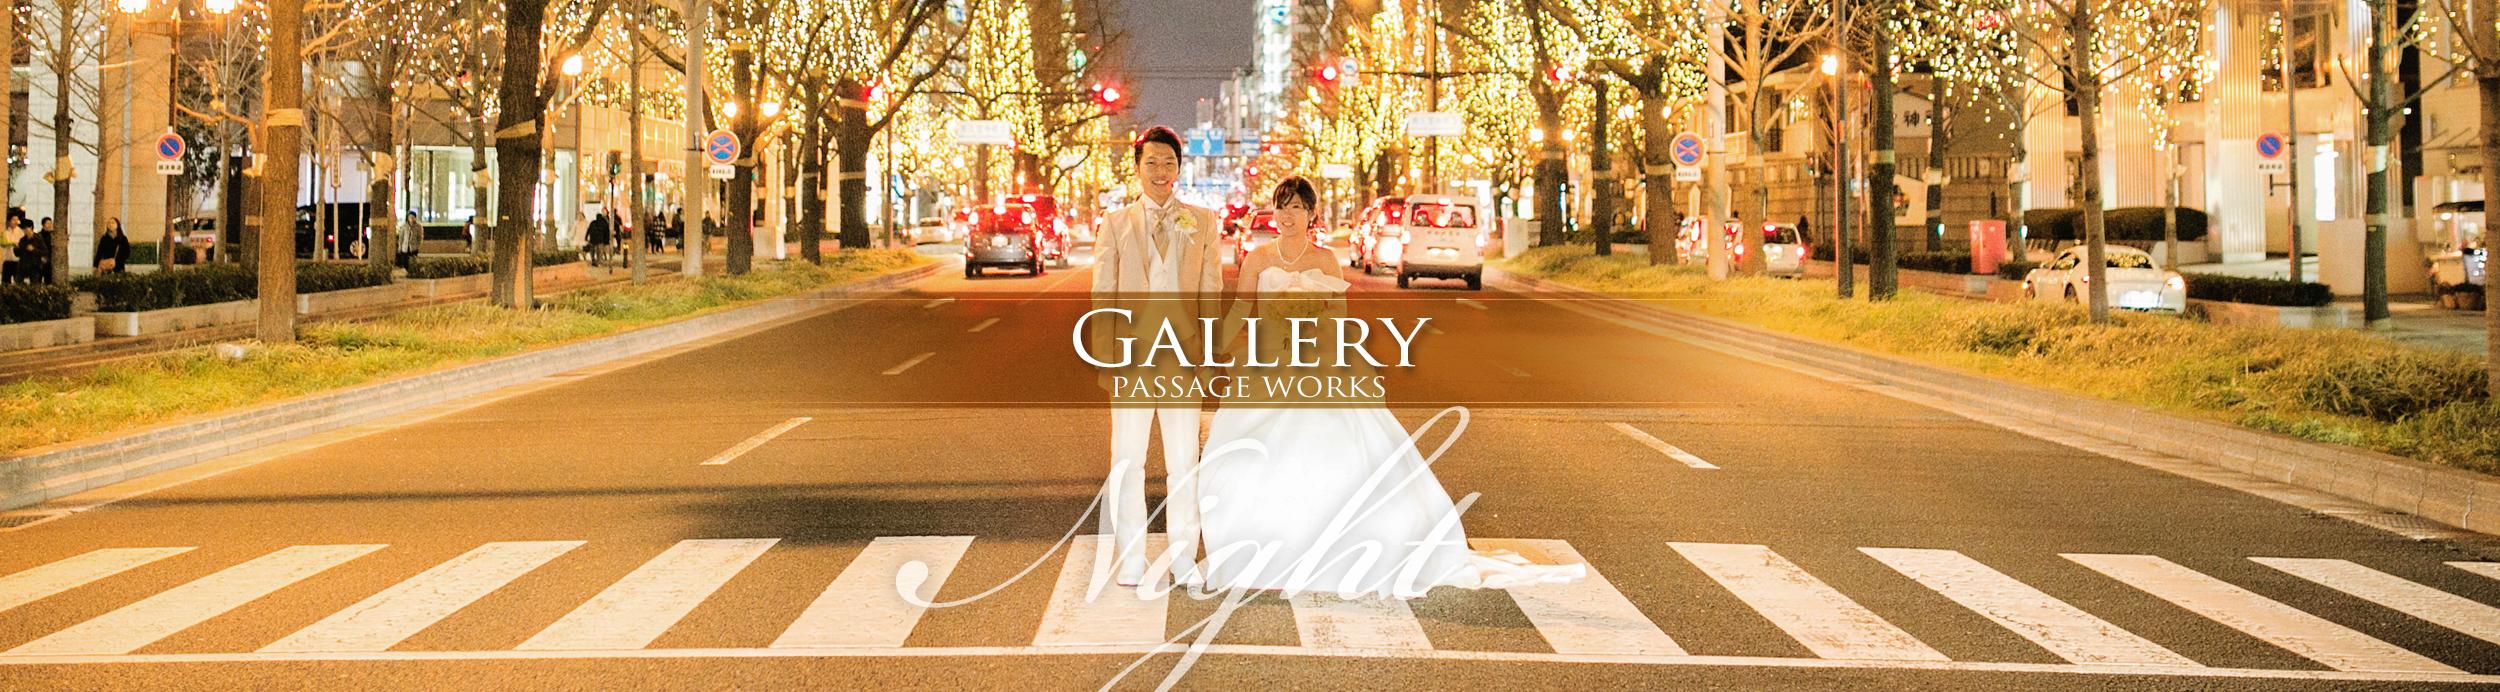 GALLERY-night|前撮ー夜間撮影